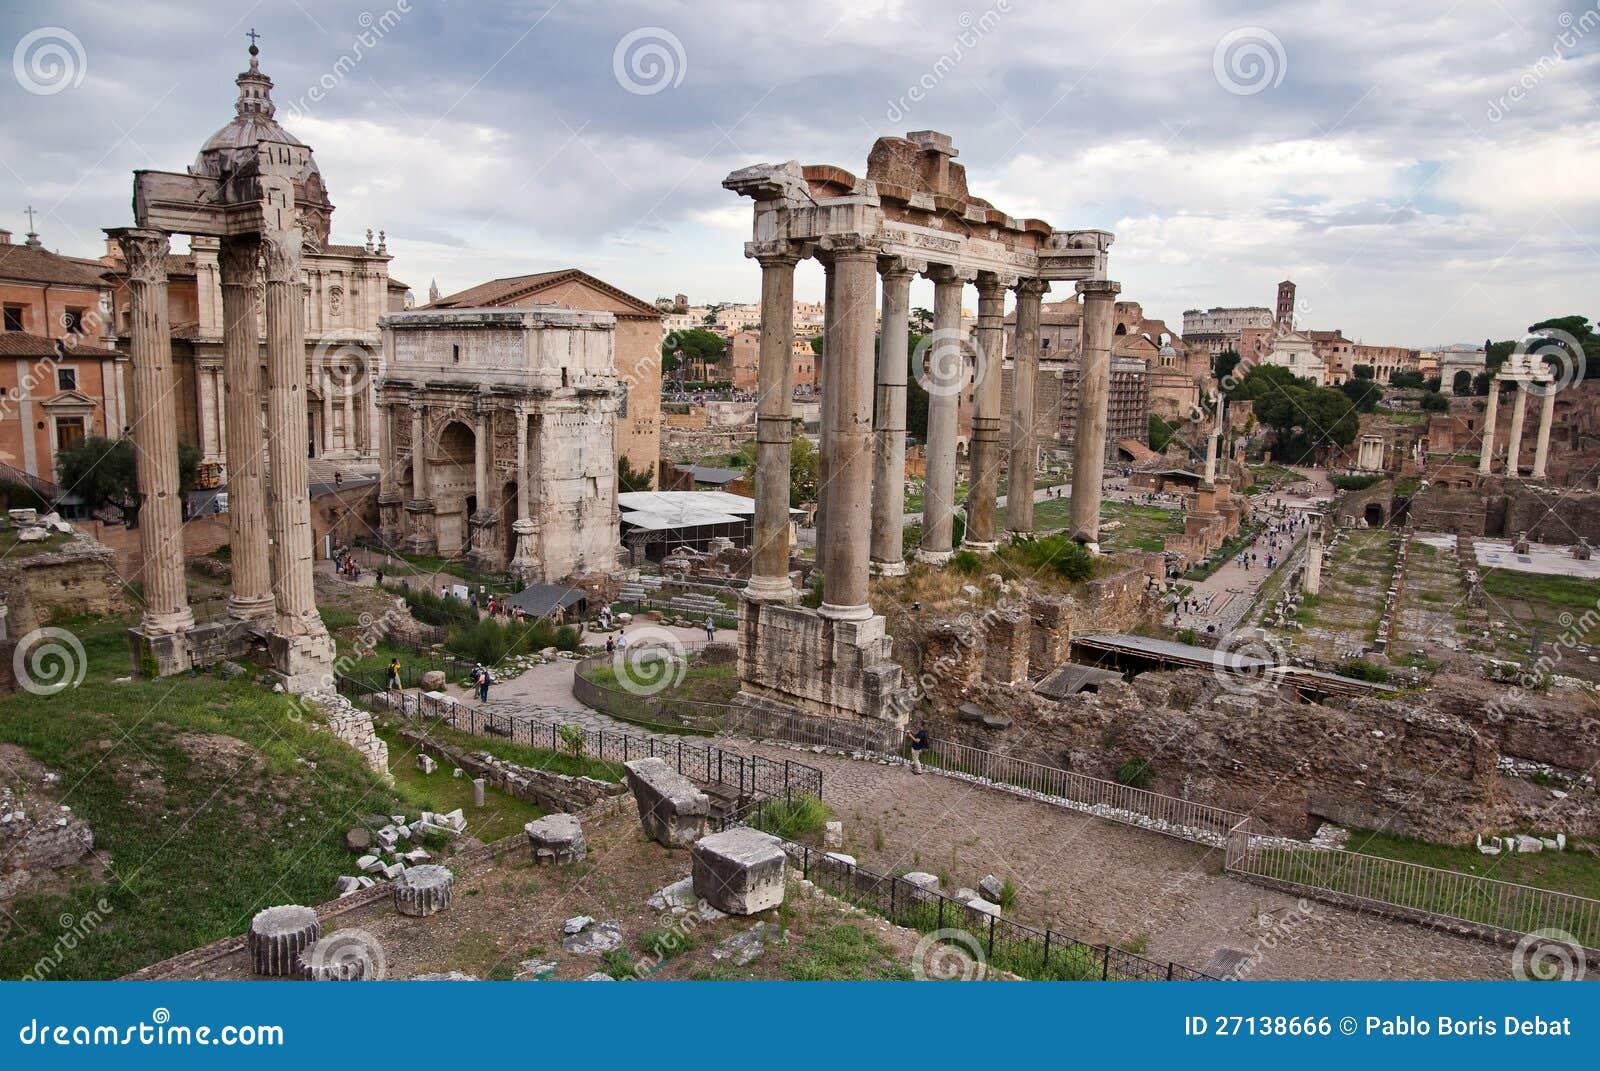 Romano De Foro De Carte Postale - Roma - Italie Photo stock - Image du rome, touristique: 27138666